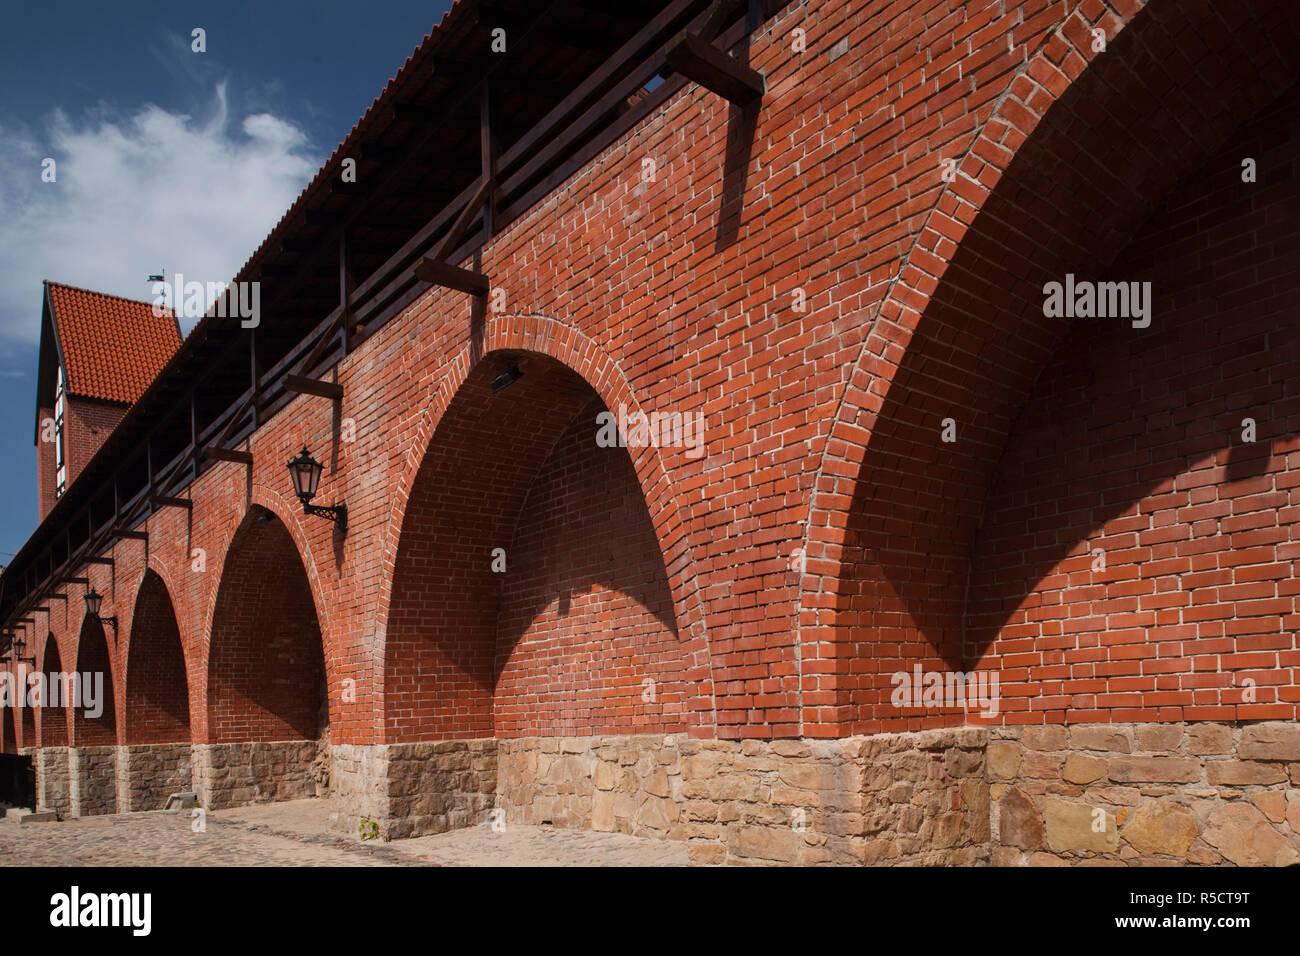 Latvia, Riga, Old Riga, Trksnu Iela Street, old city walls - Stock Image